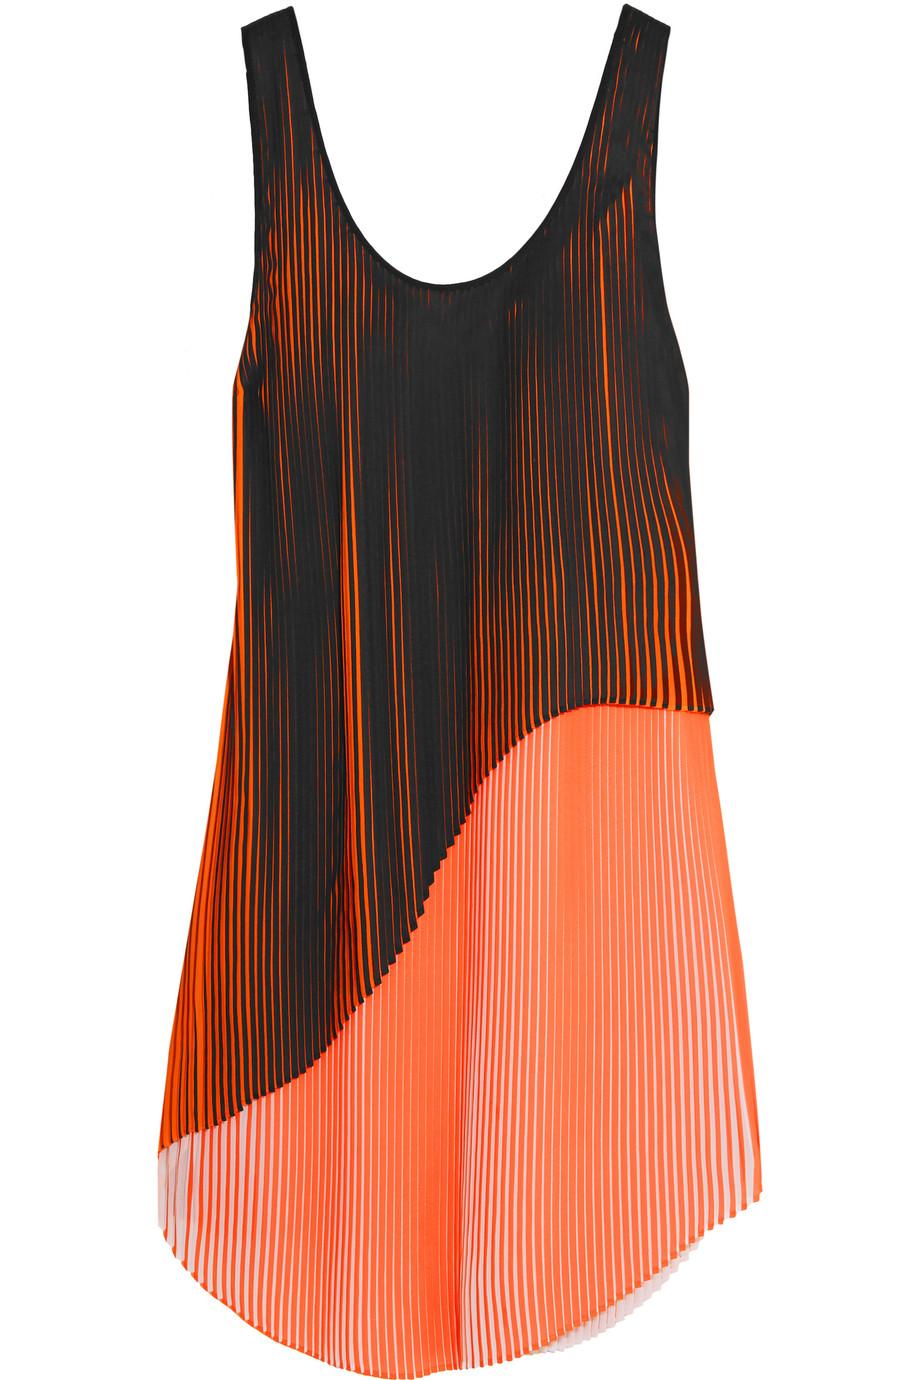 Stella Mccartney Fatima Plissé-Georgette Mini Dress, Orange, Women's, Size: 36